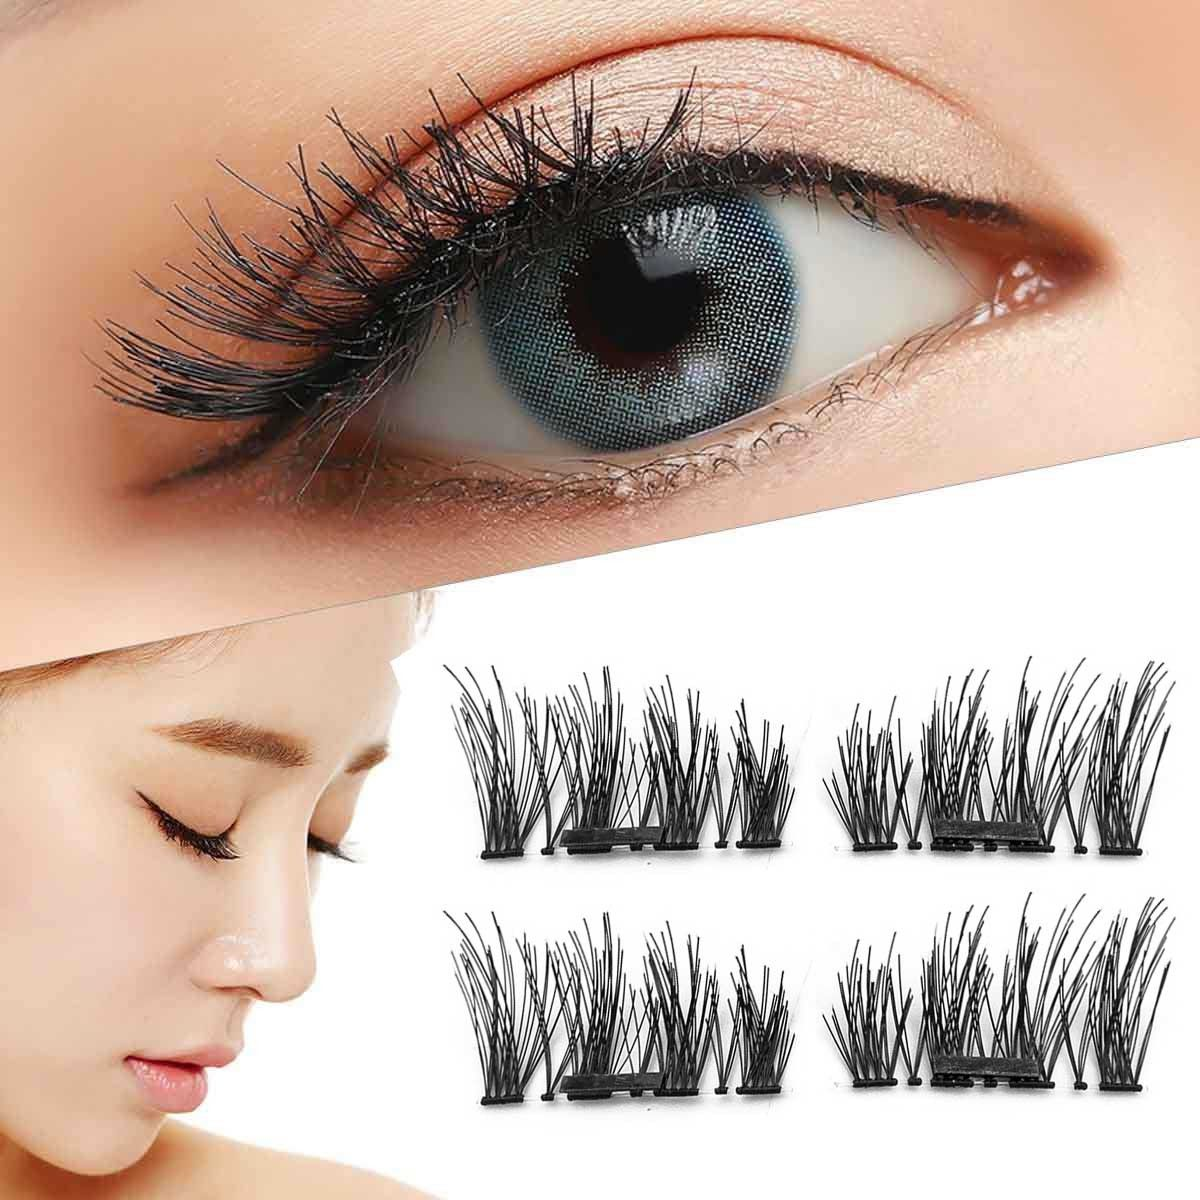 ac5b3db40c0 4Pcs Reusable Magnetic 3D False Eyelashes Long Natural Fake Eye Lashes US